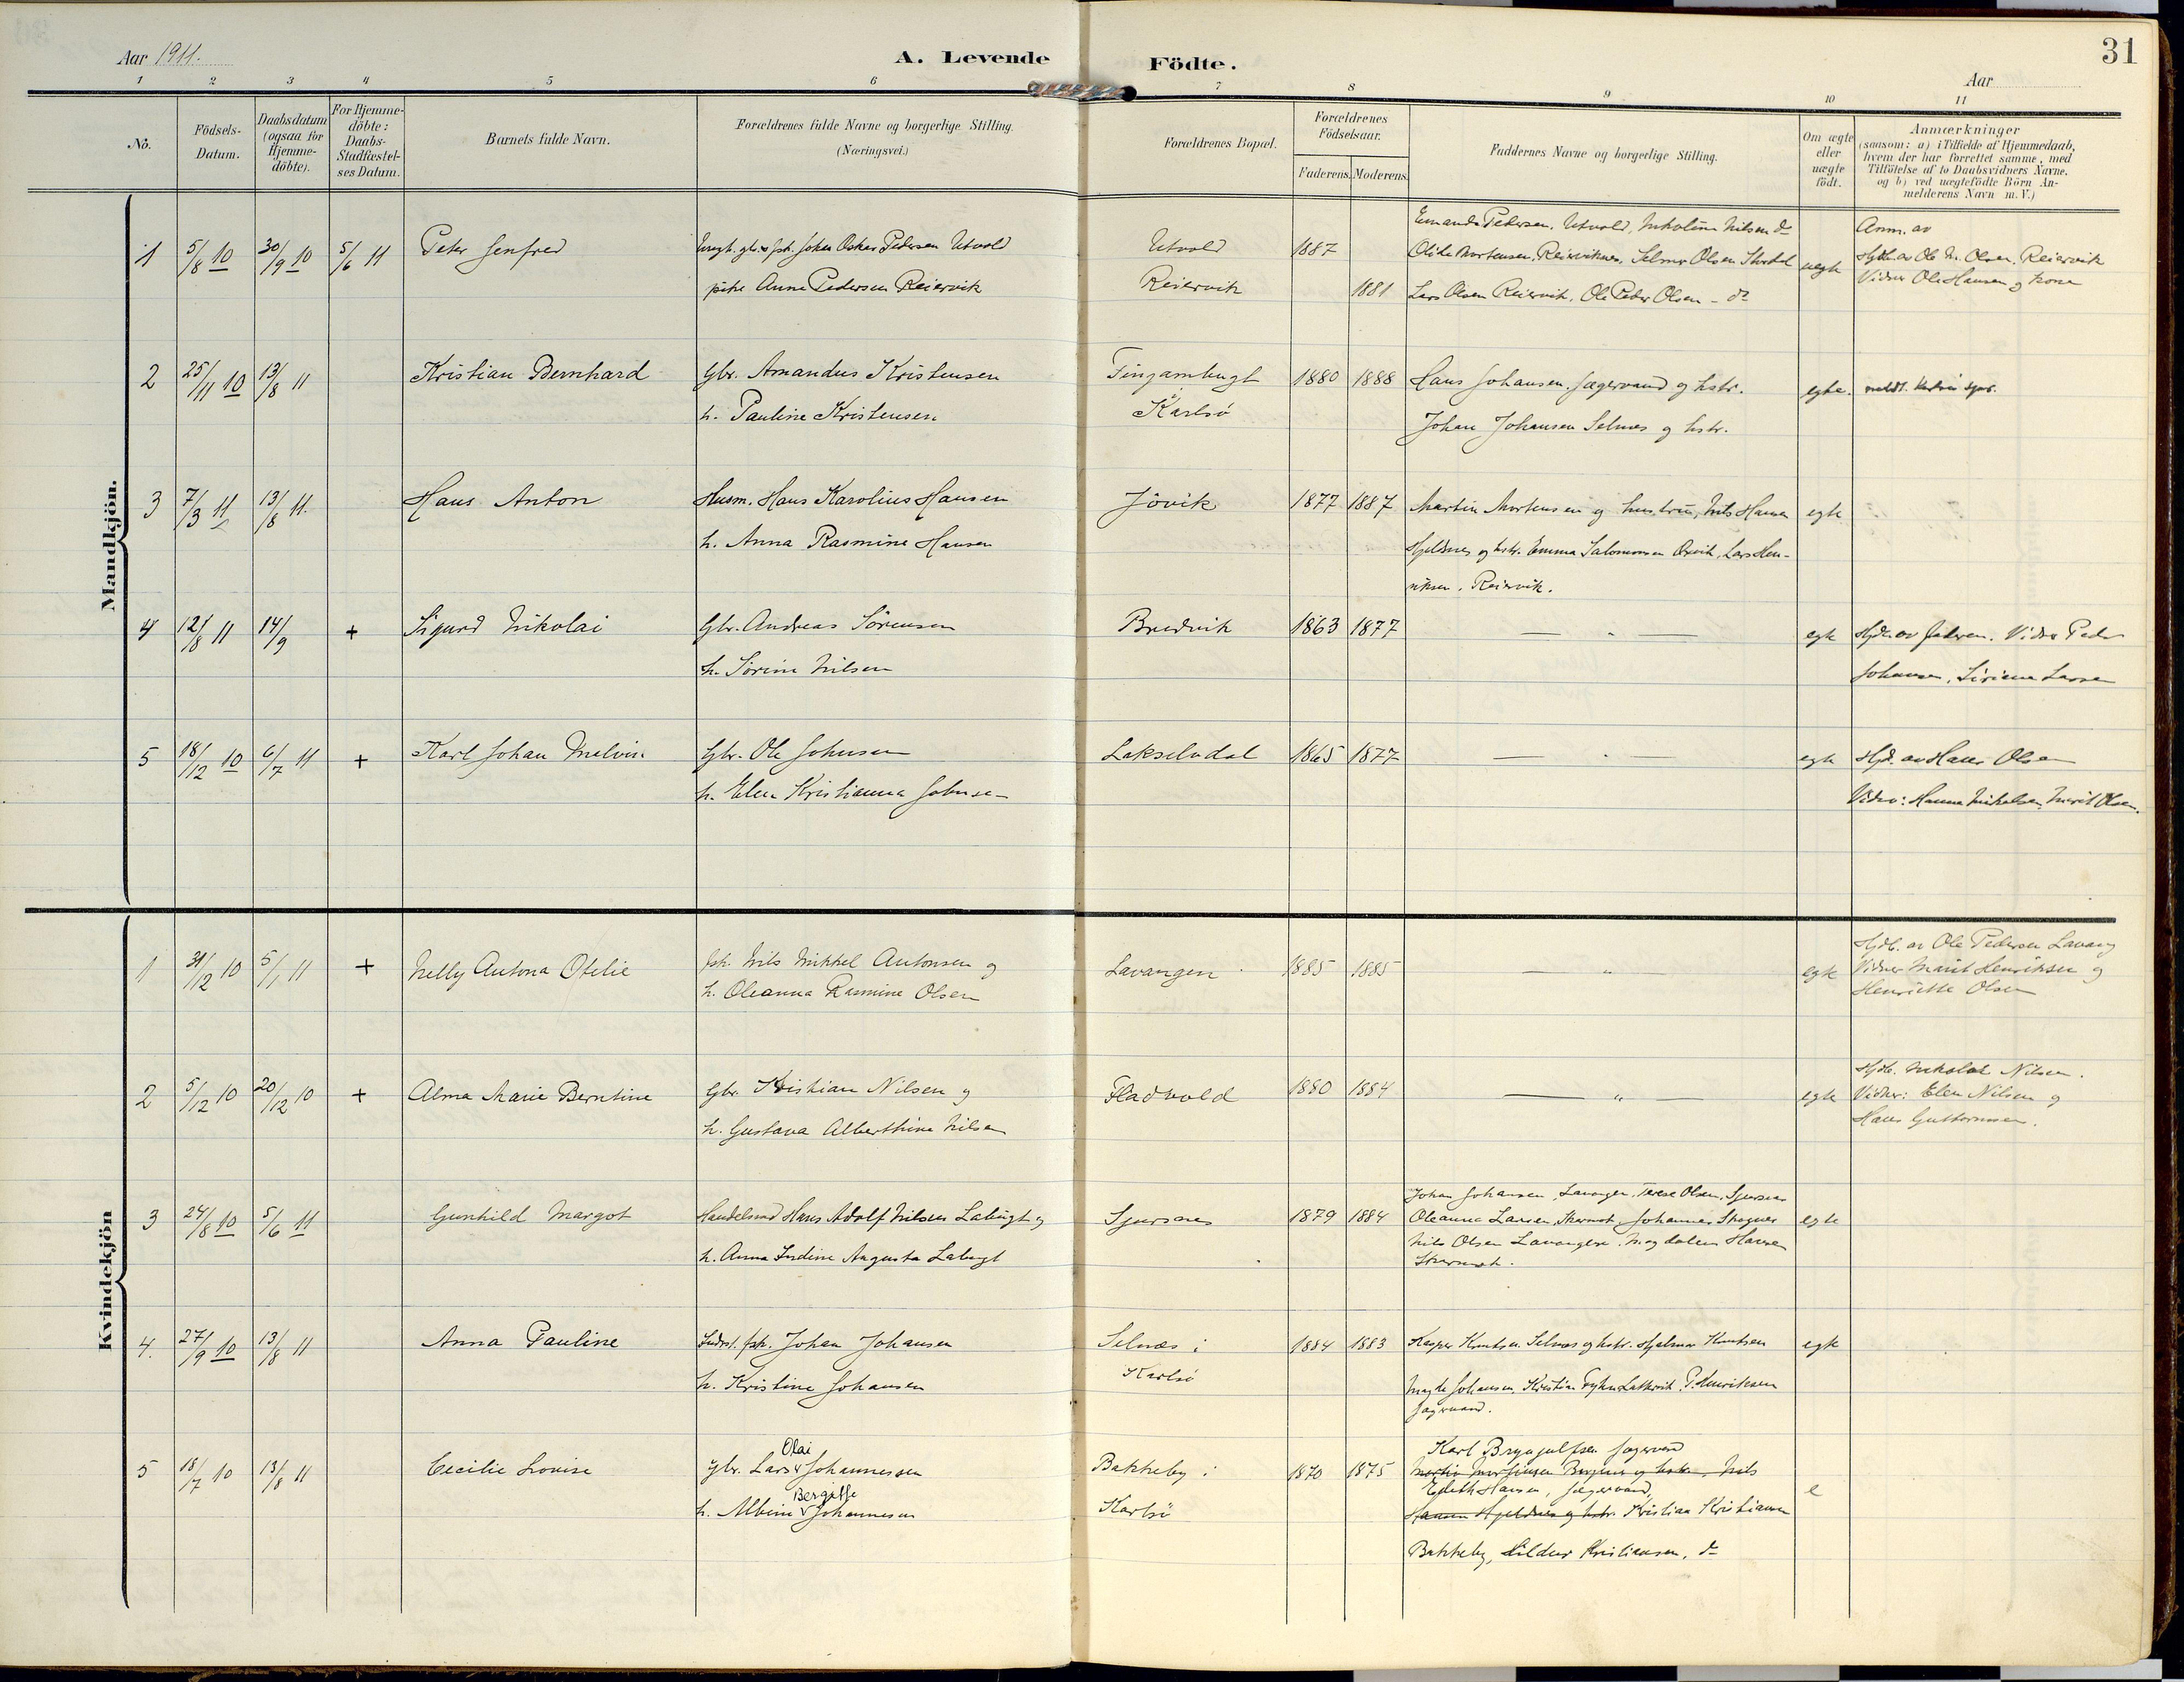 SATØ, Lyngen sokneprestembete, Ministerialbok nr. 14, 1905-1920, s. 31